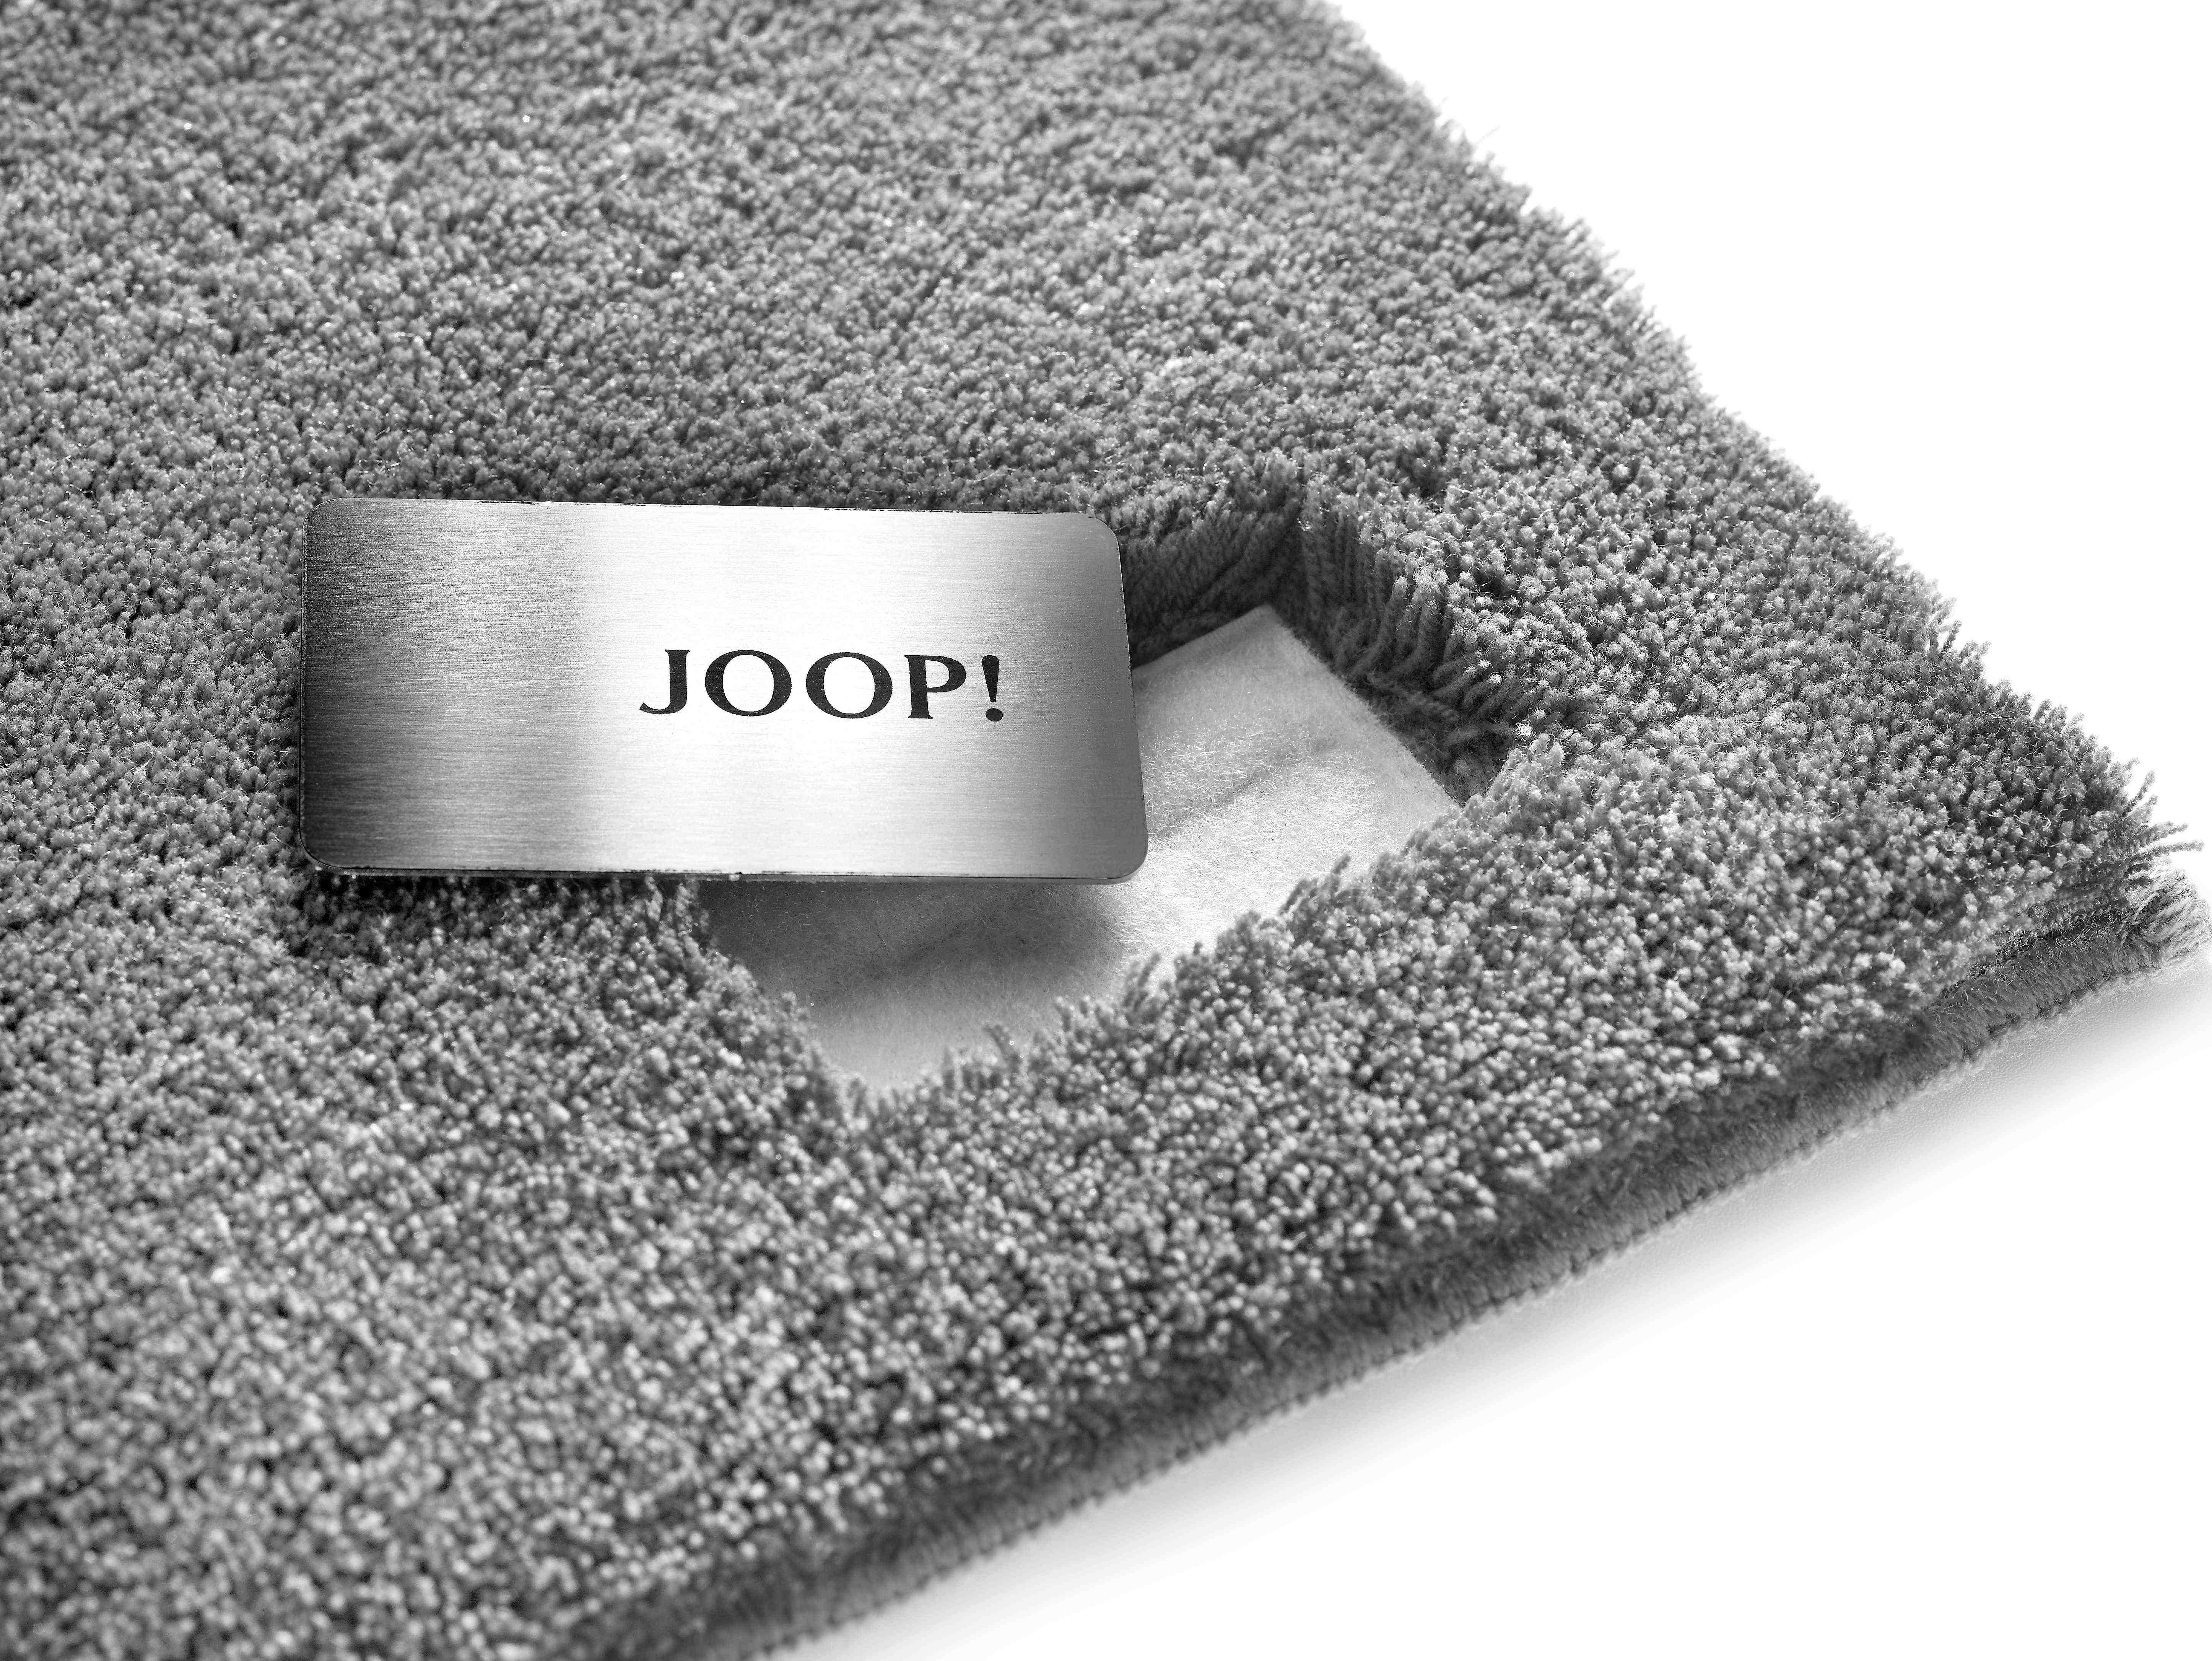 joop badteppich luxury. Black Bedroom Furniture Sets. Home Design Ideas